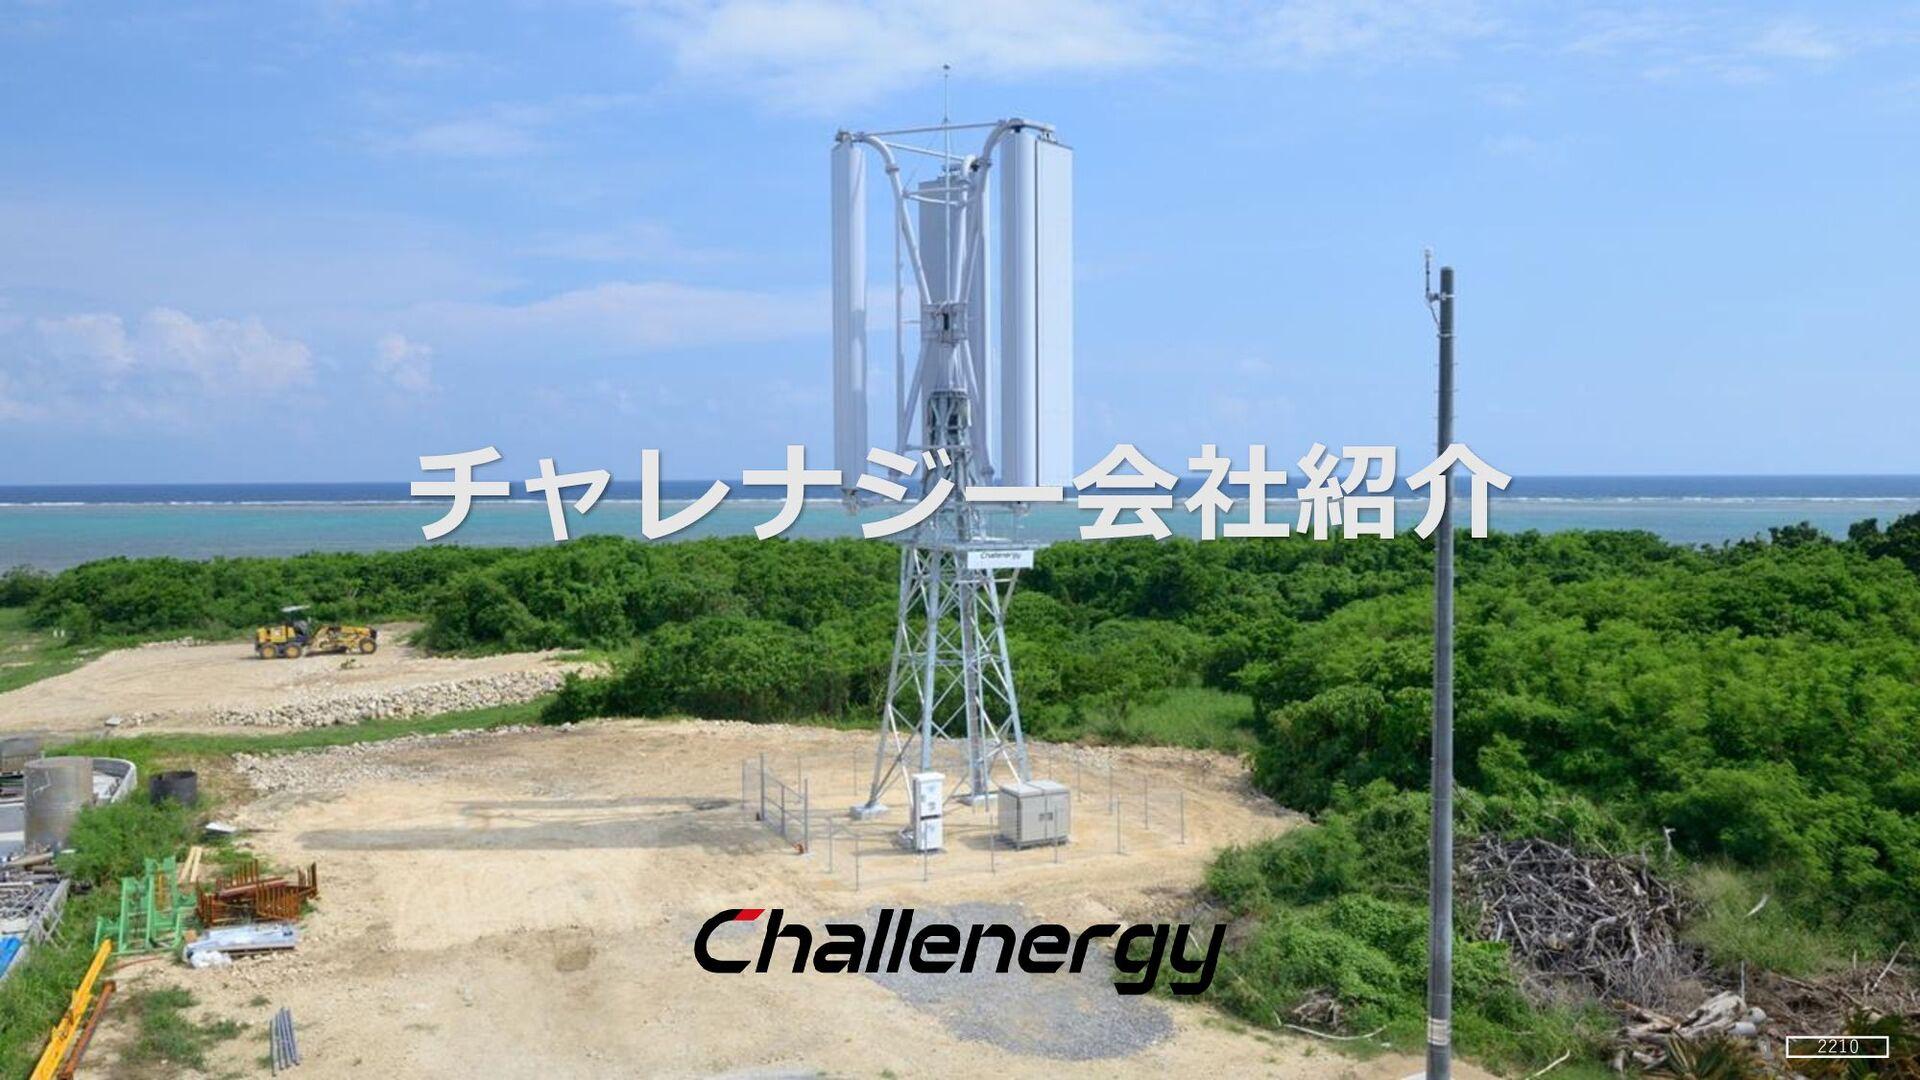 Challenergy 採用スライド coming soon...